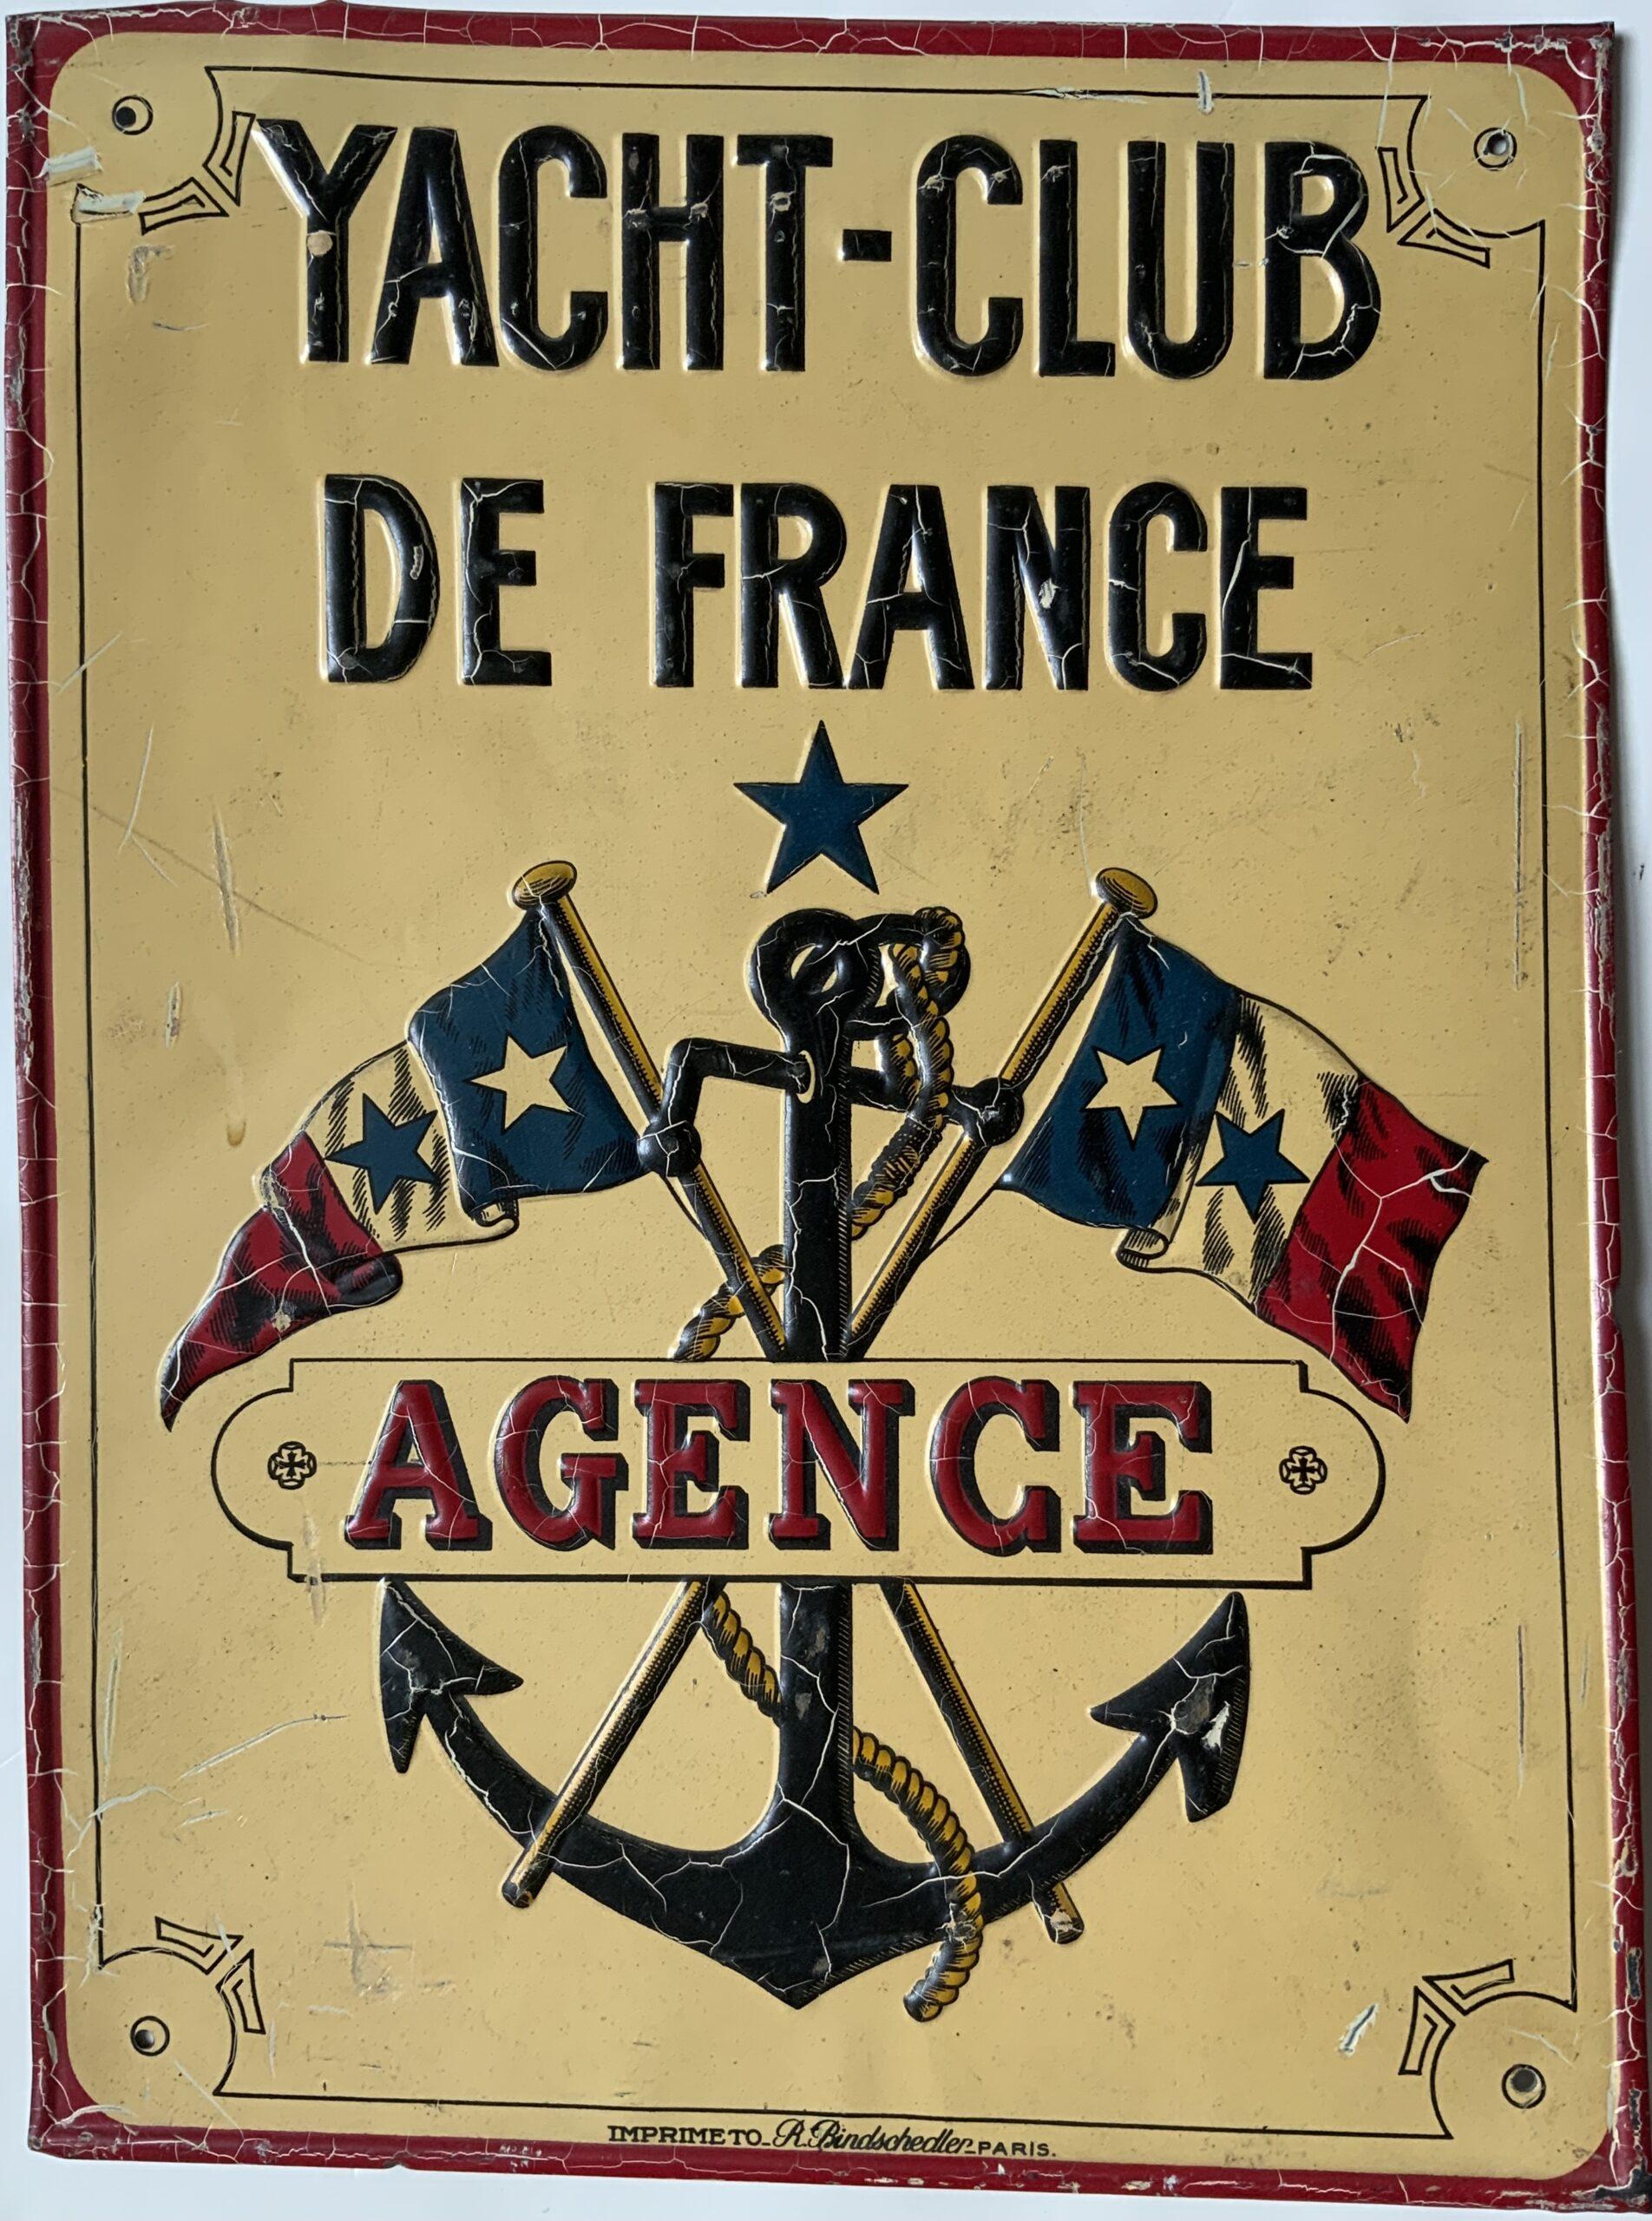 M179YACHT-CLUB DE FRANCE